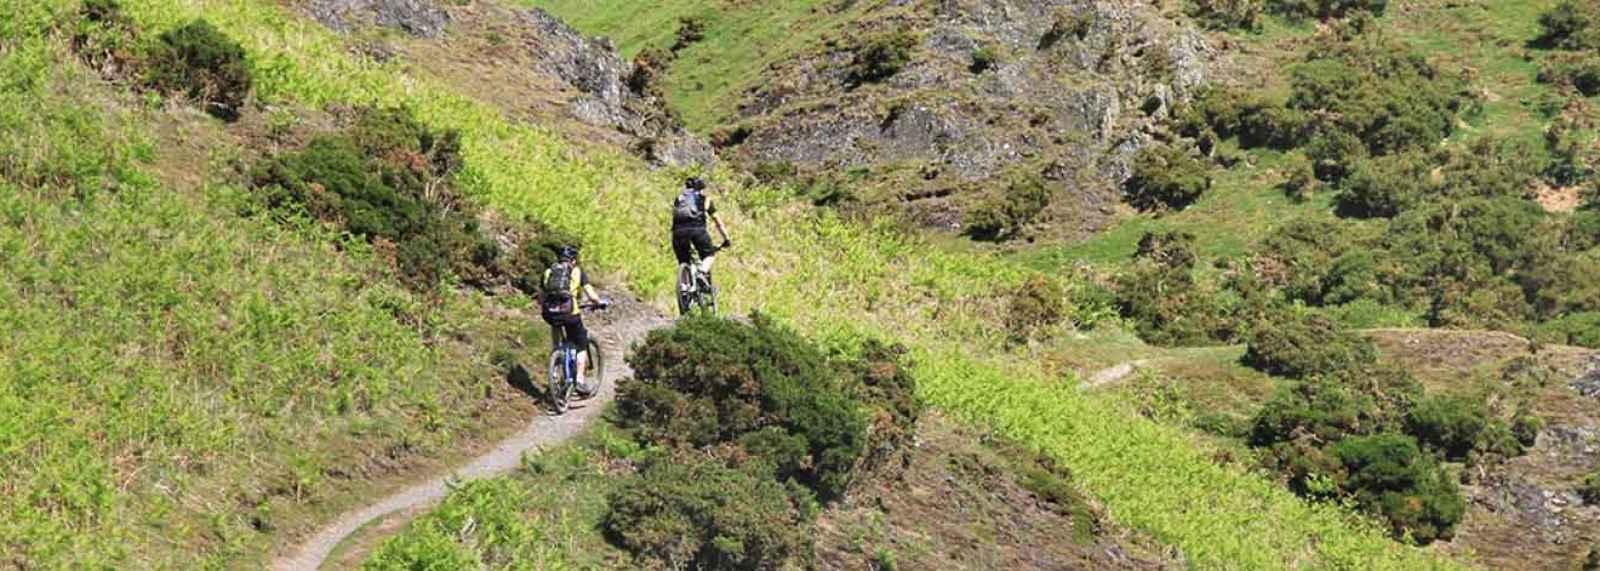 Cycling Shropshire Riding Track